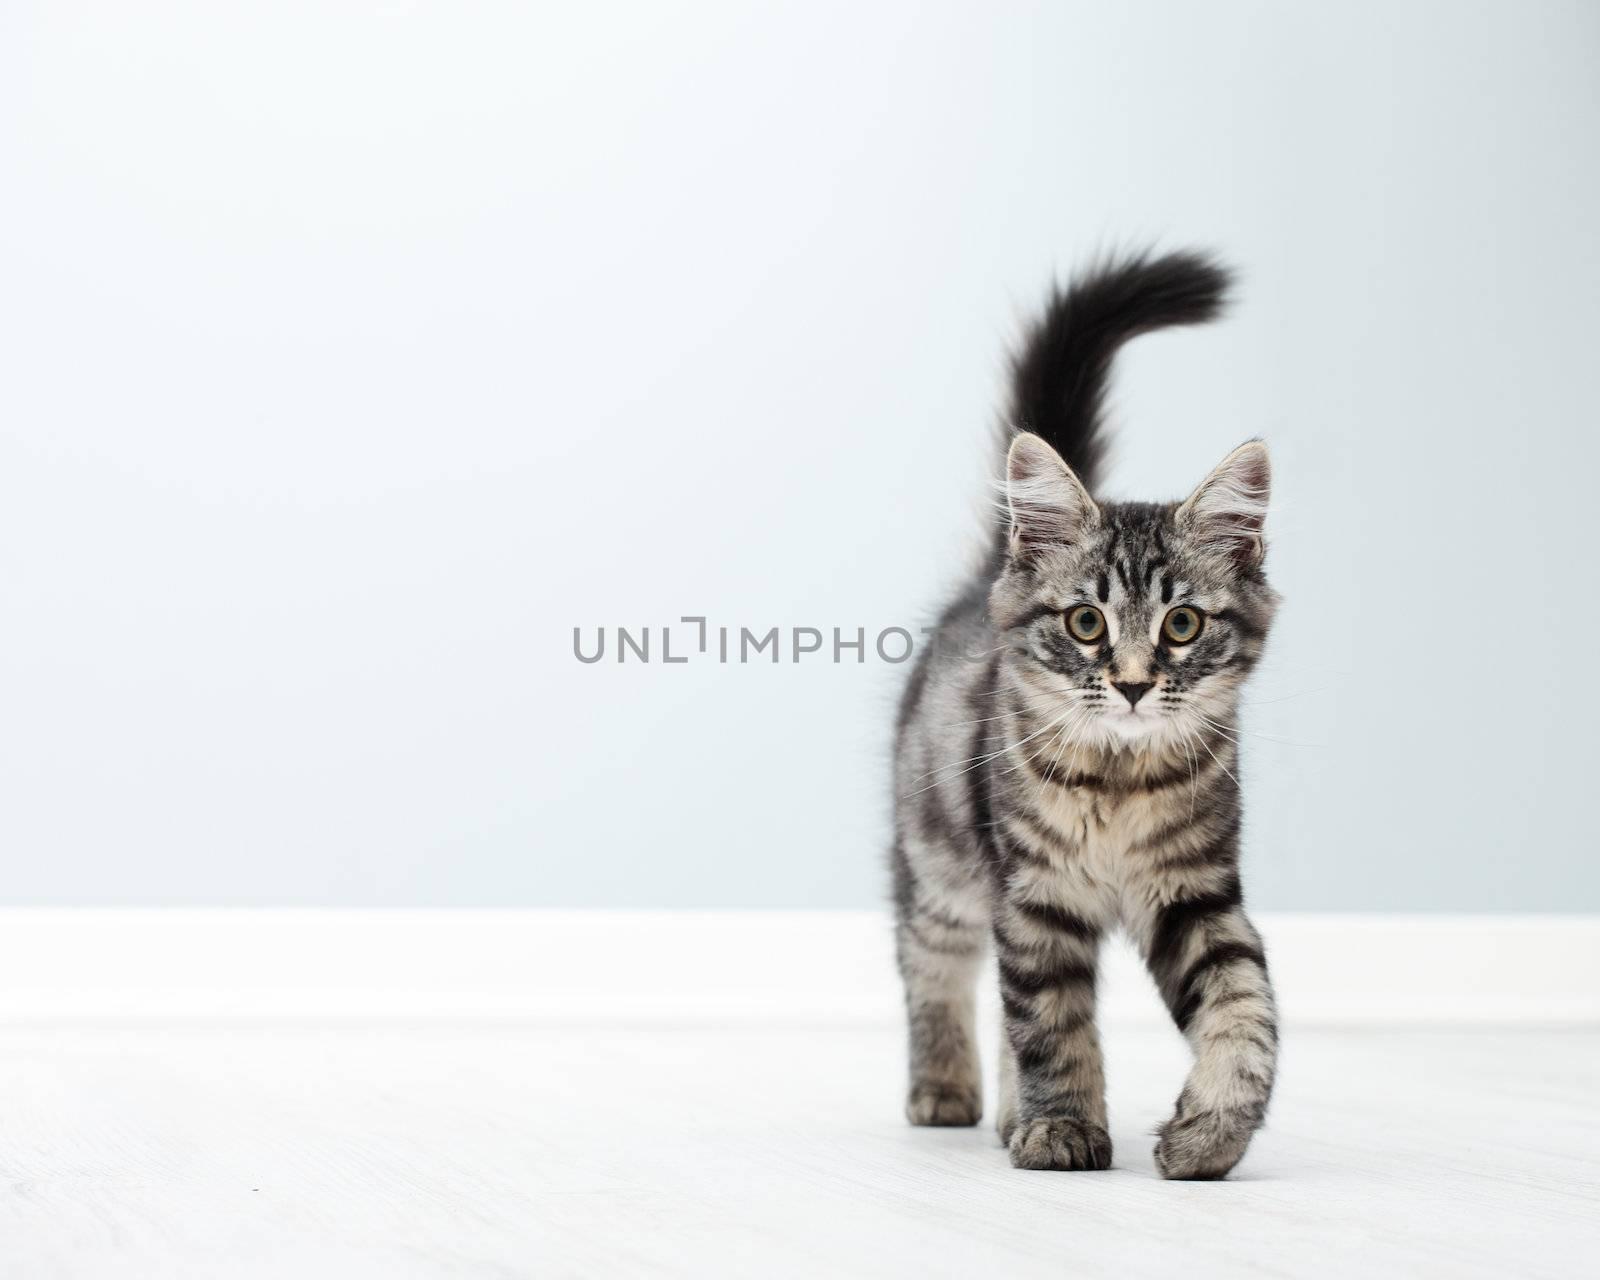 Cute kitten walking on floor at home